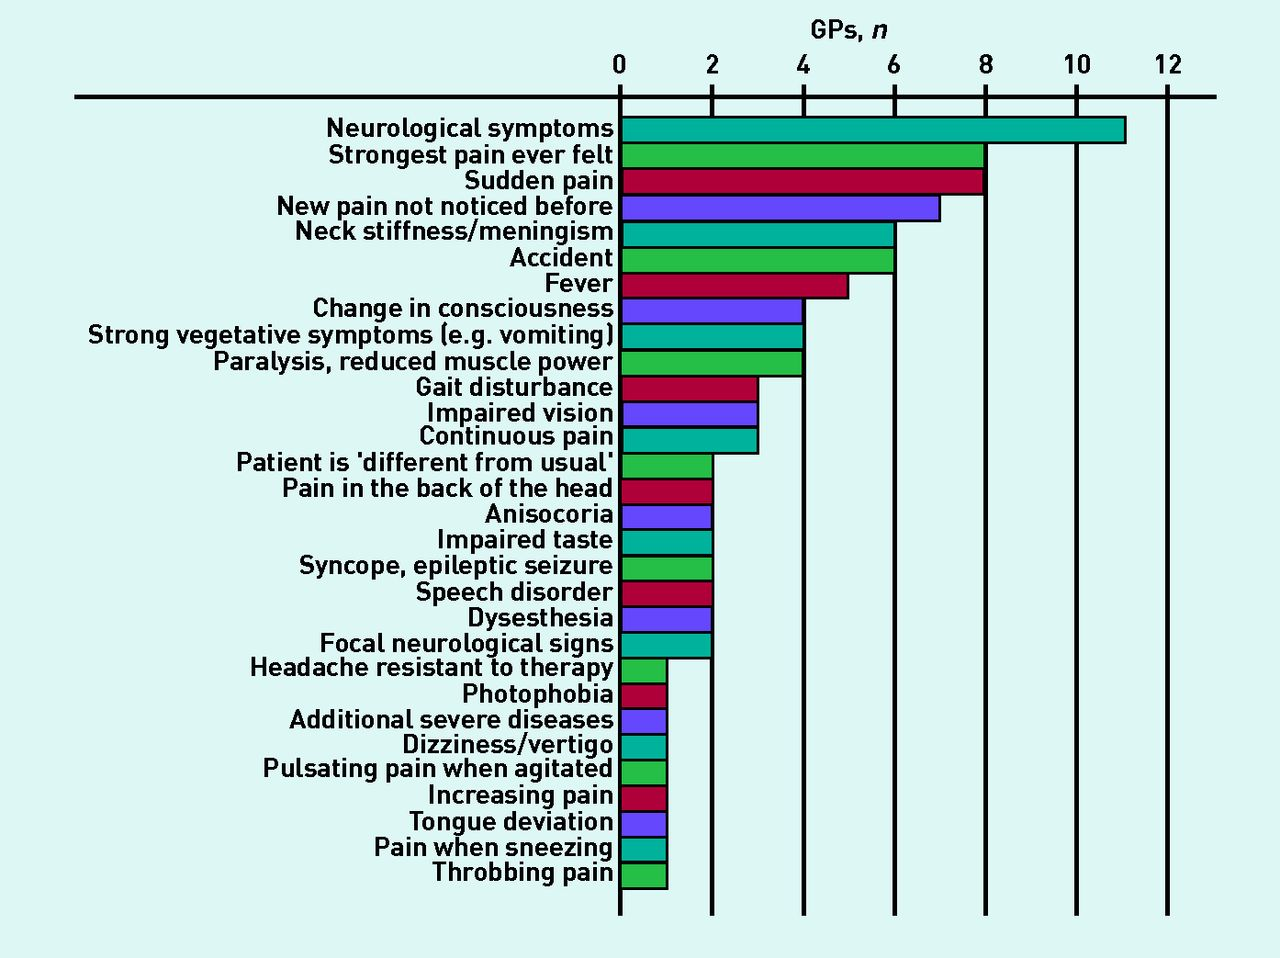 Diagnosing headache in primary care: a qualitative study of GPs ...